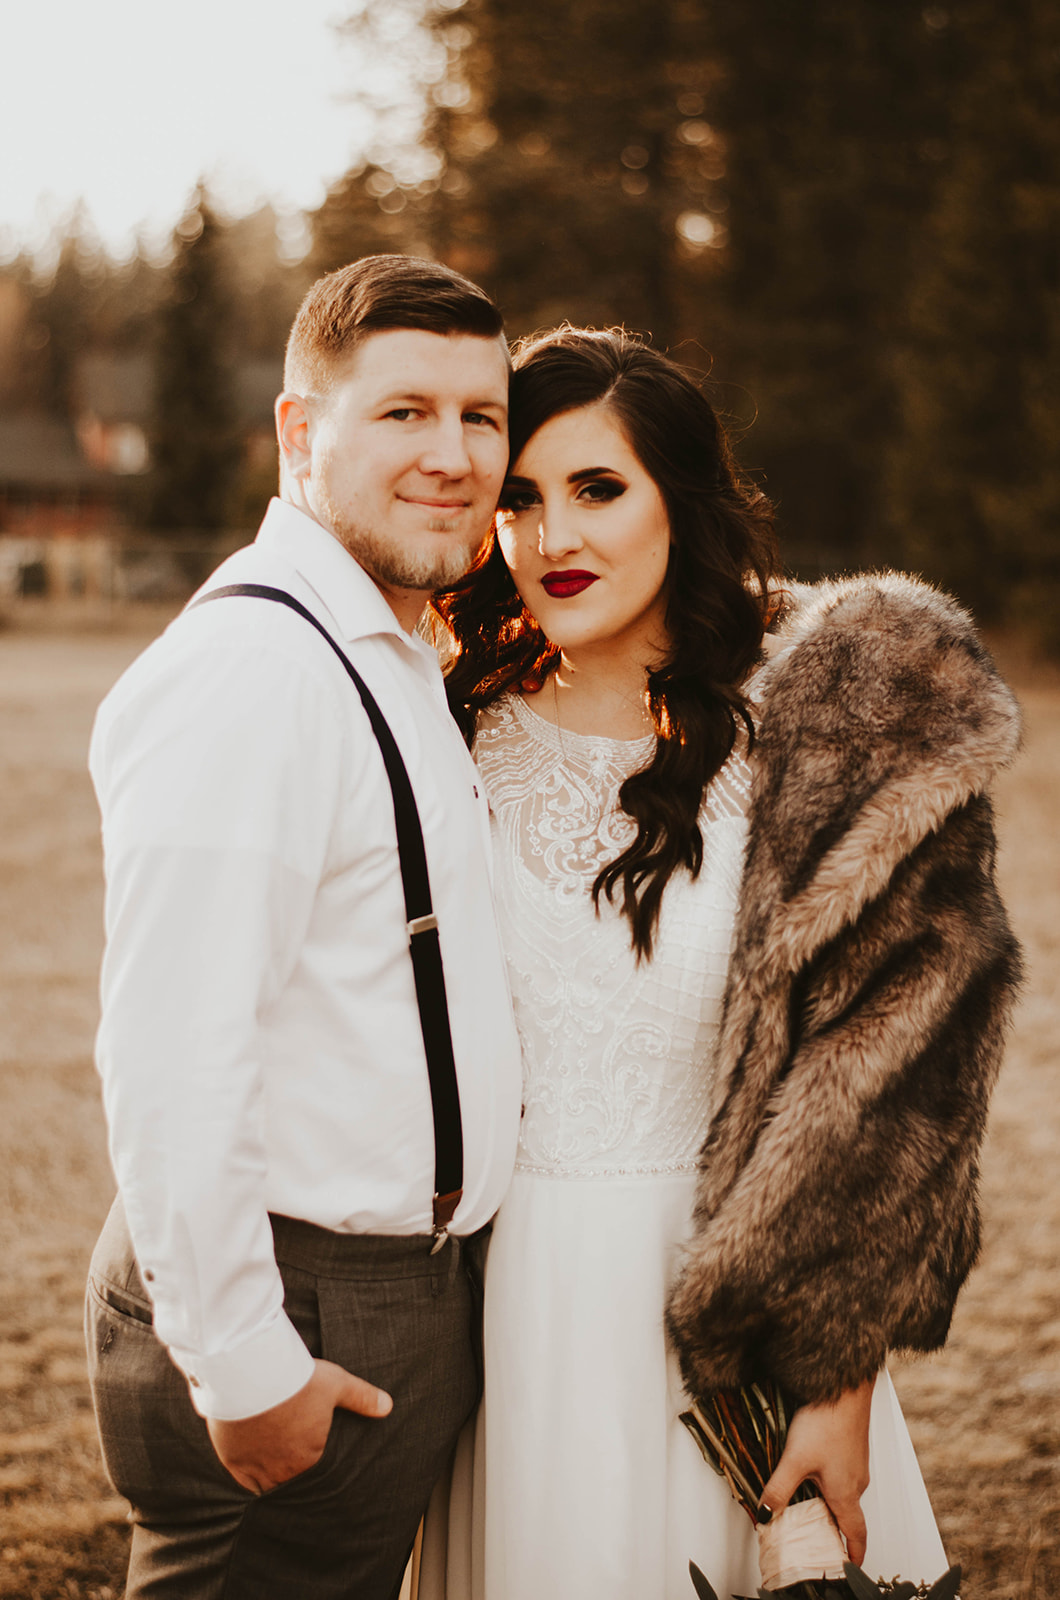 bride and groom wedding dress spokane